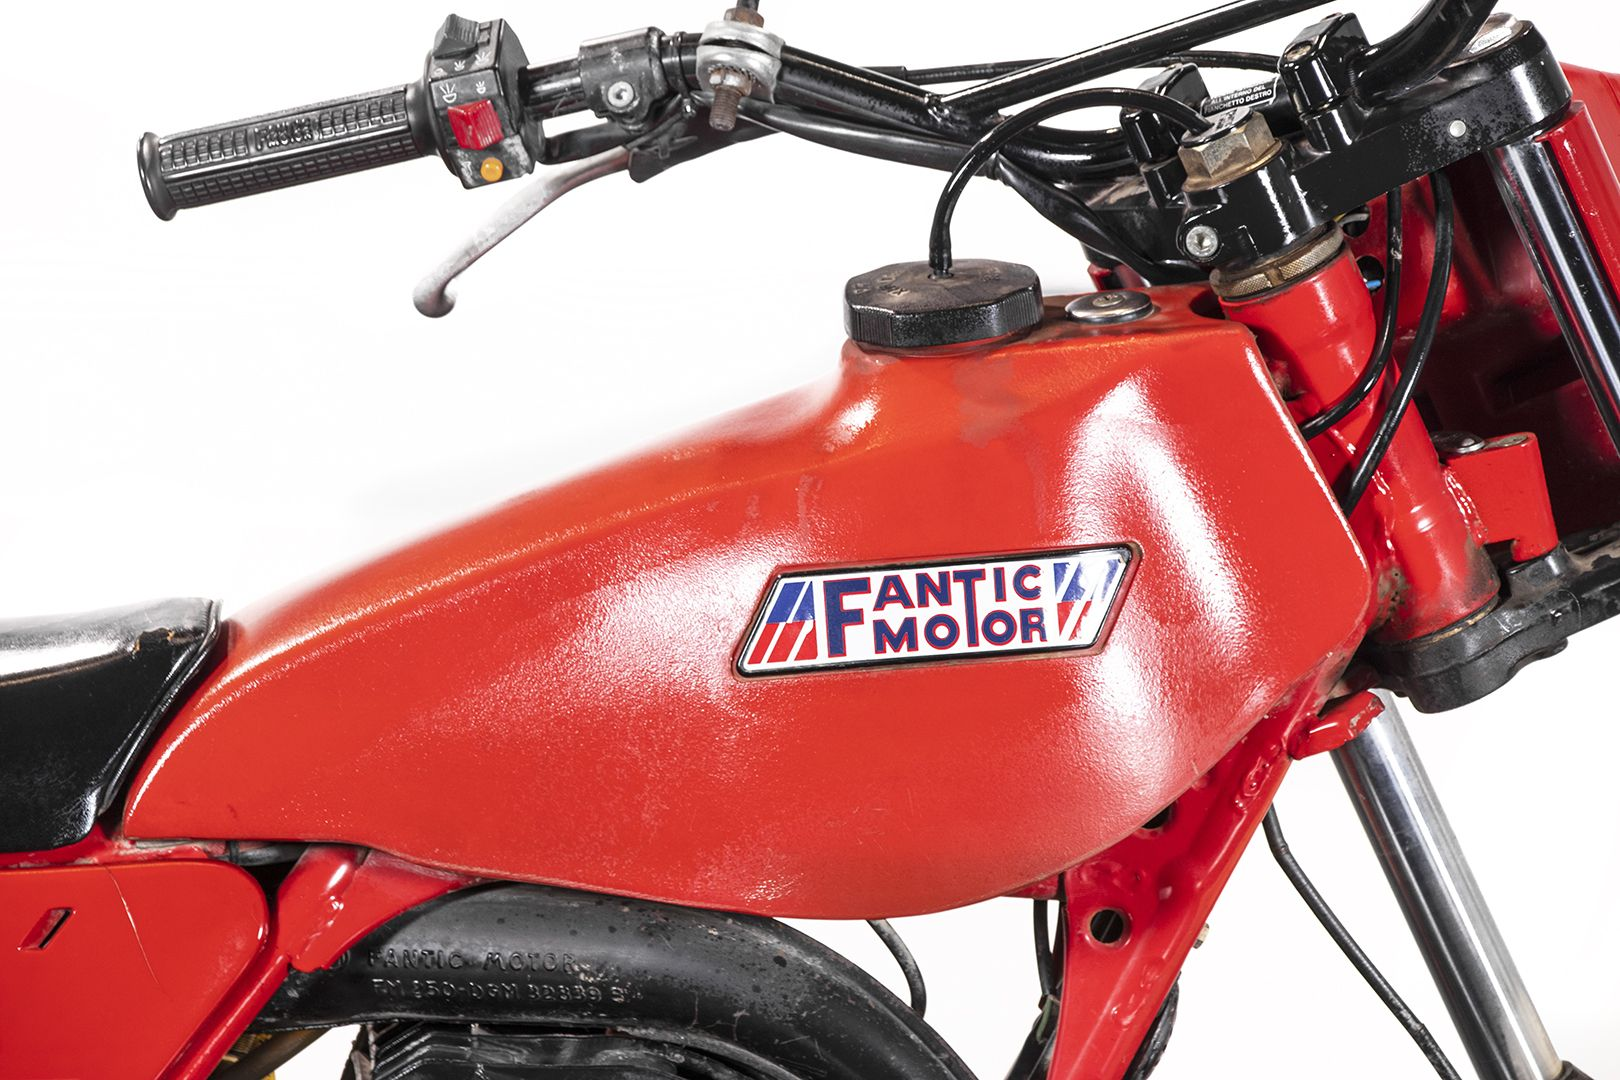 1981 Fantic Motor TX 250 61454